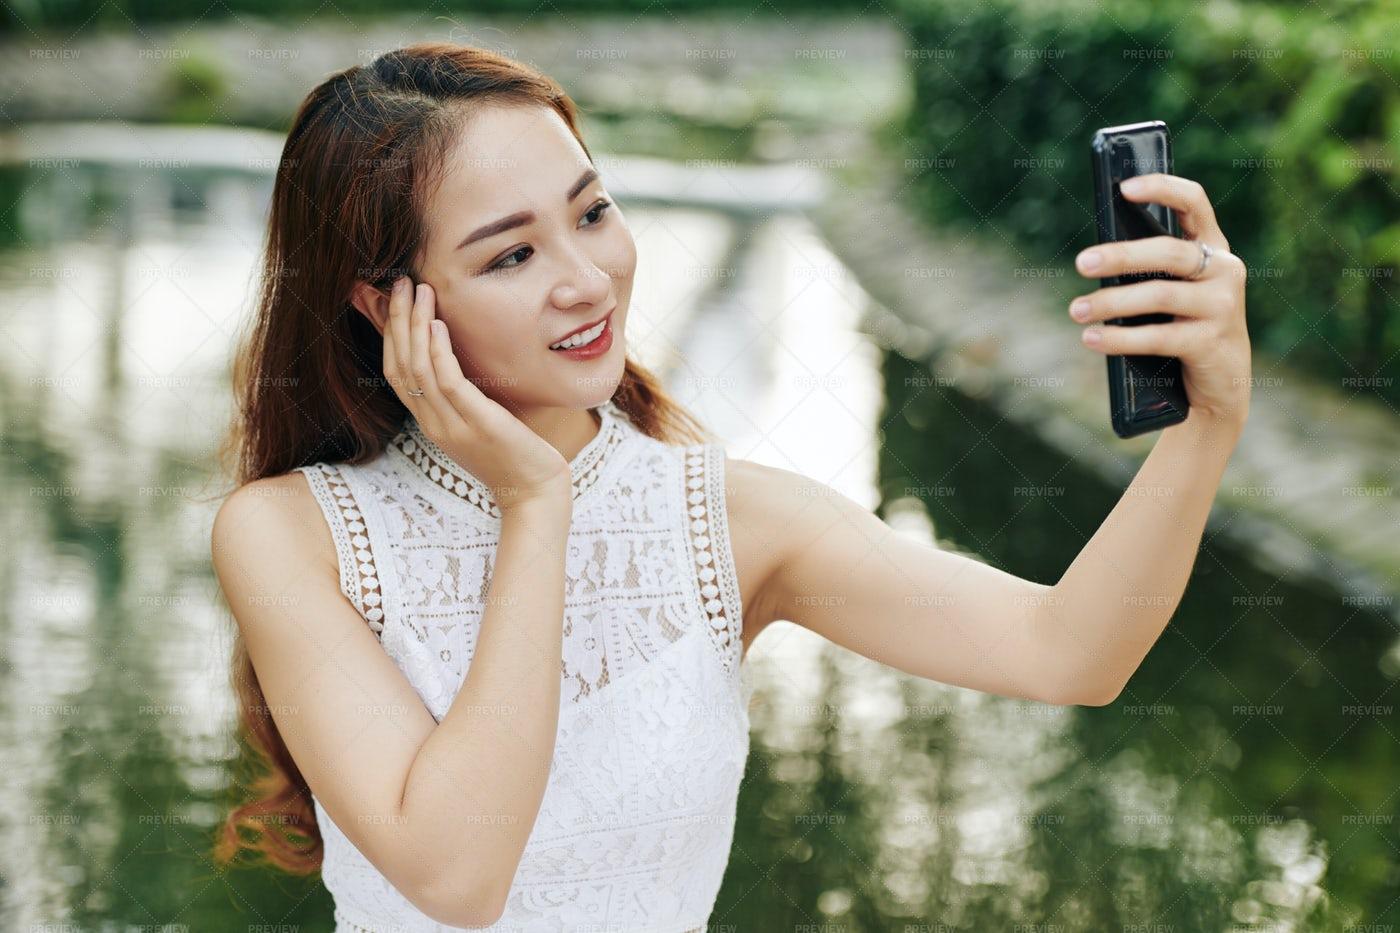 Beautiful Woman Posing For Photo: Stock Photos